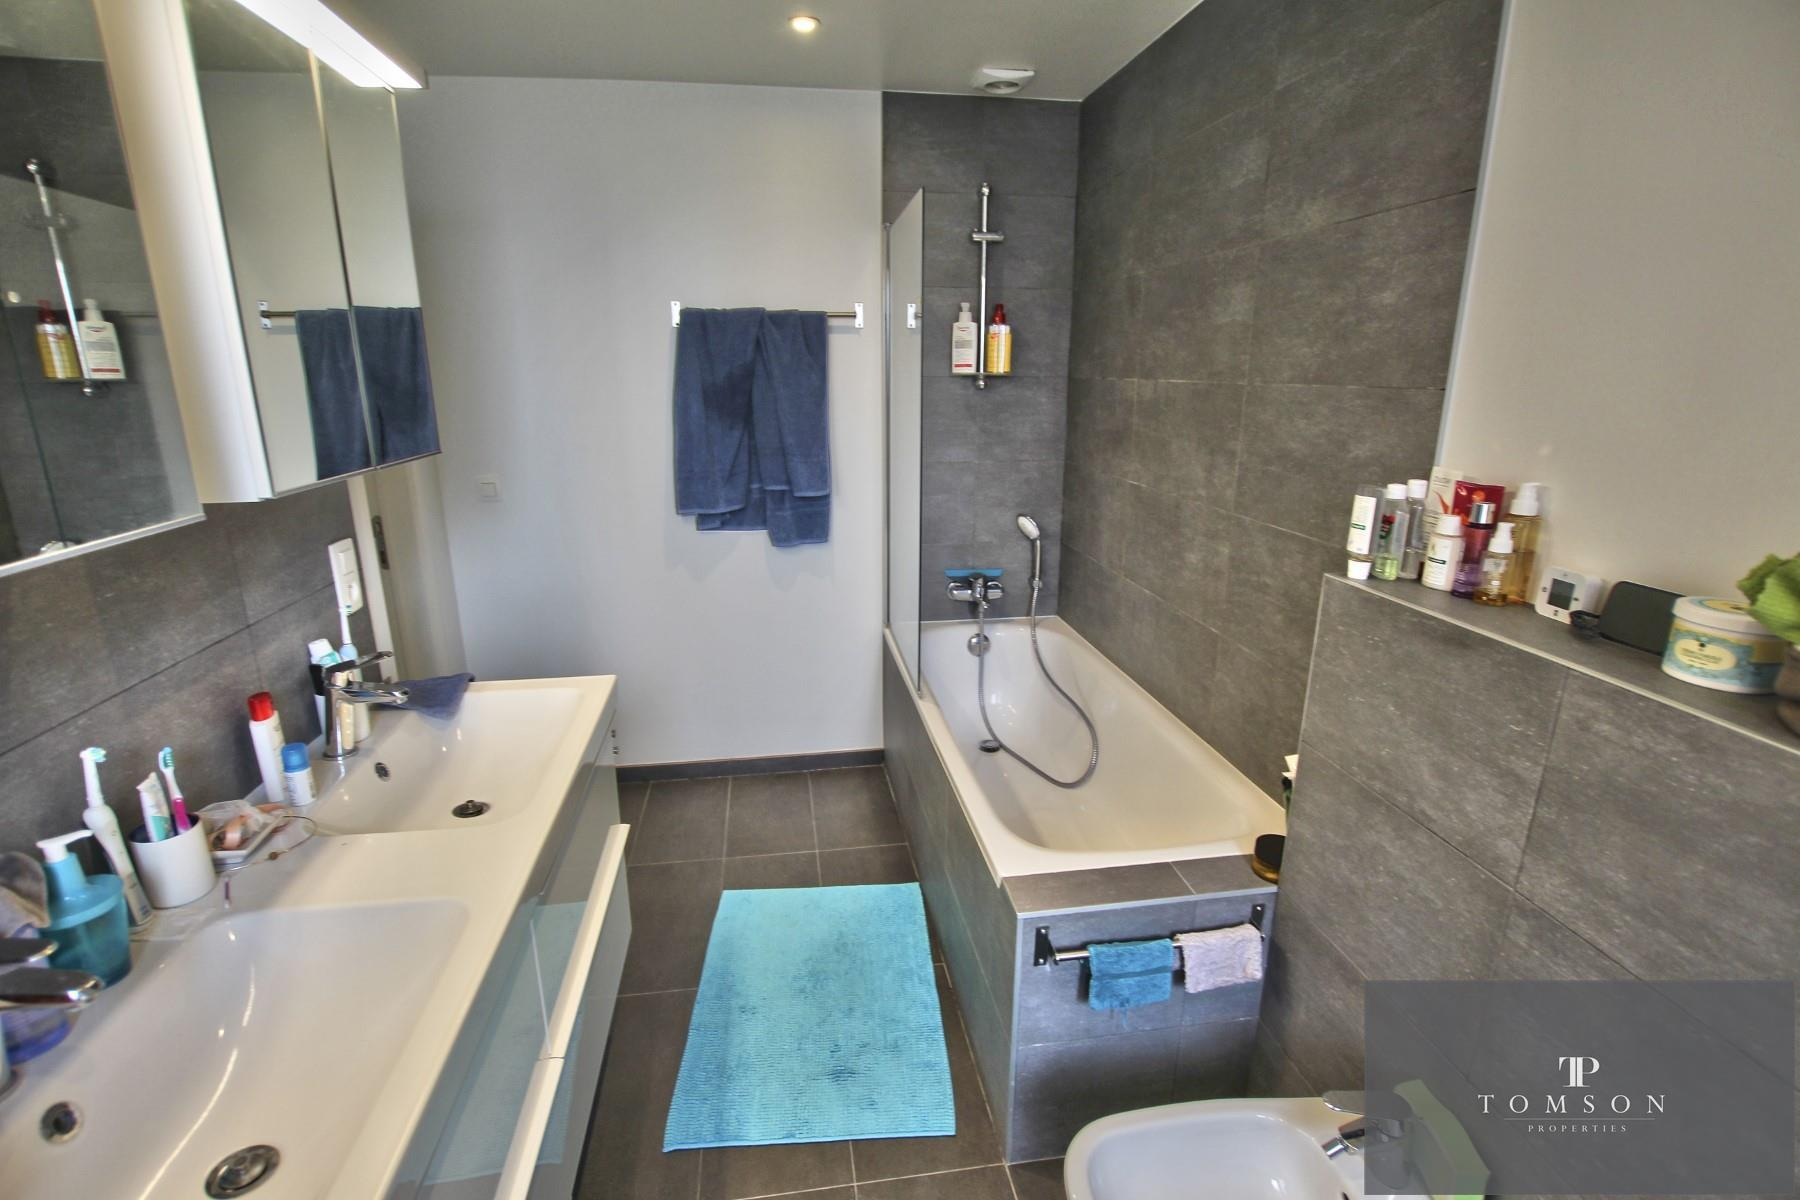 Appartement exceptionnel - Woluwe-Saint-Pierre - #4324789-9